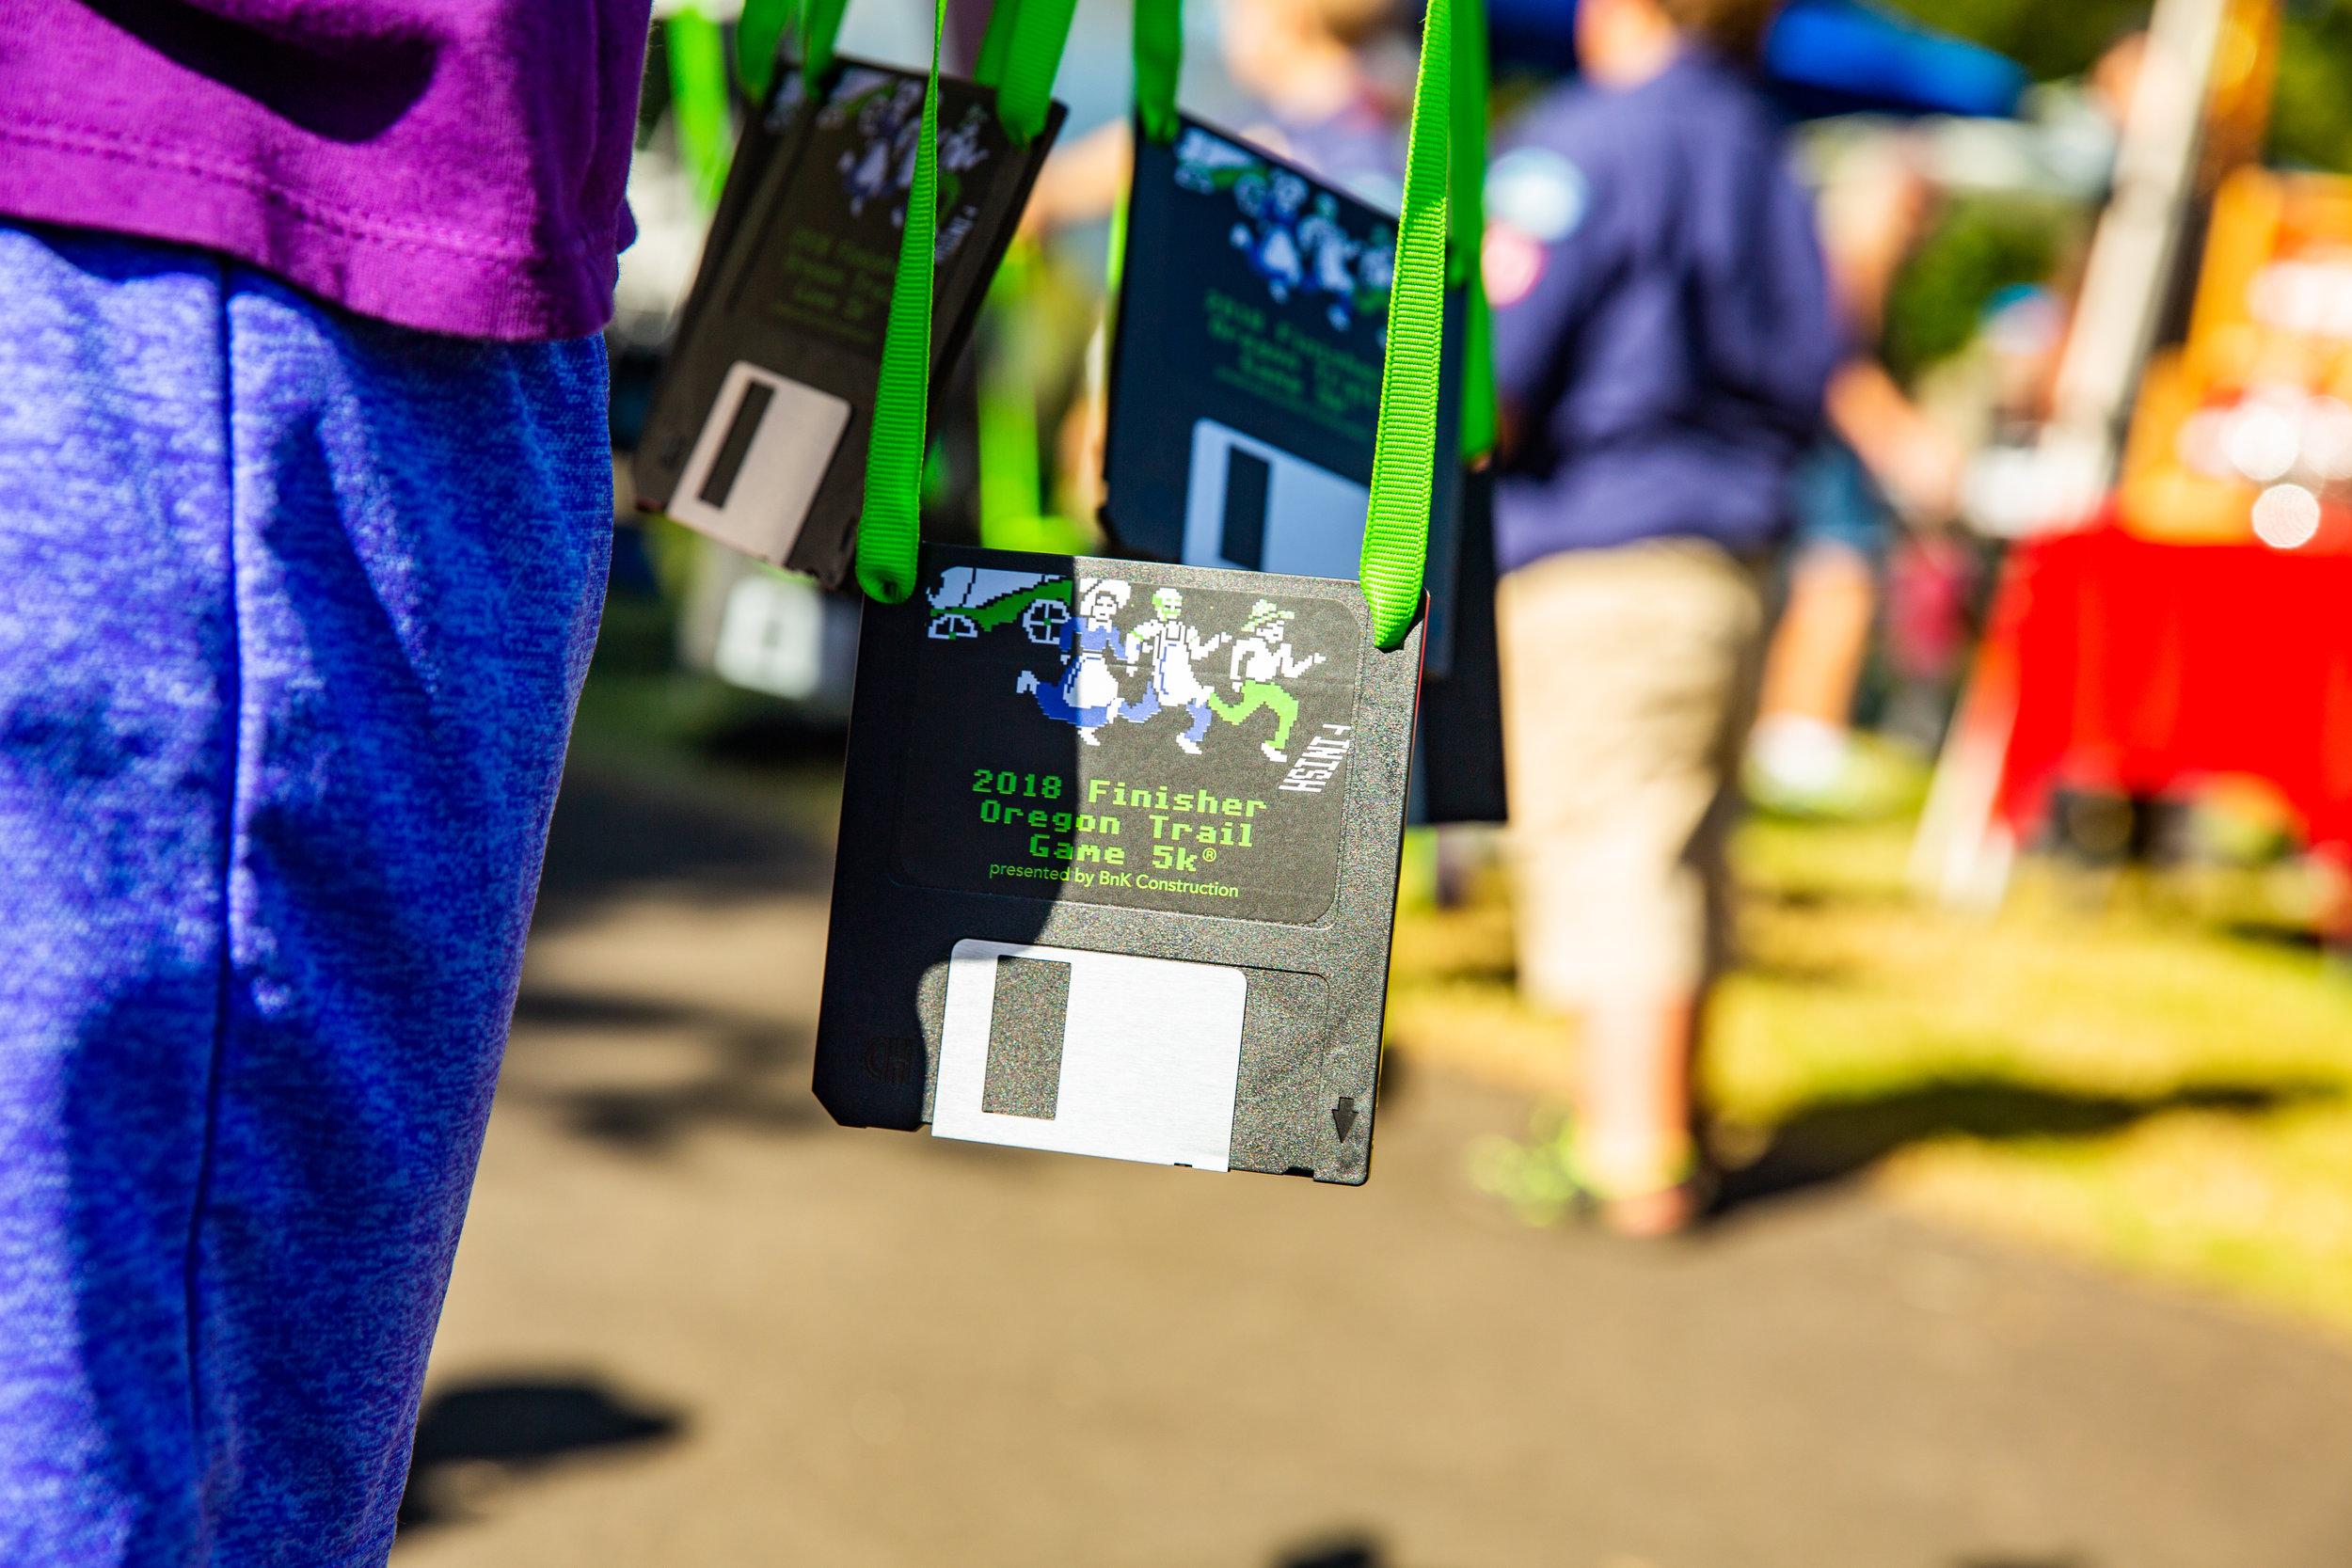 080518-Downtown-Oregon-City-5K-Run-Final-Selects-HR-10.jpg